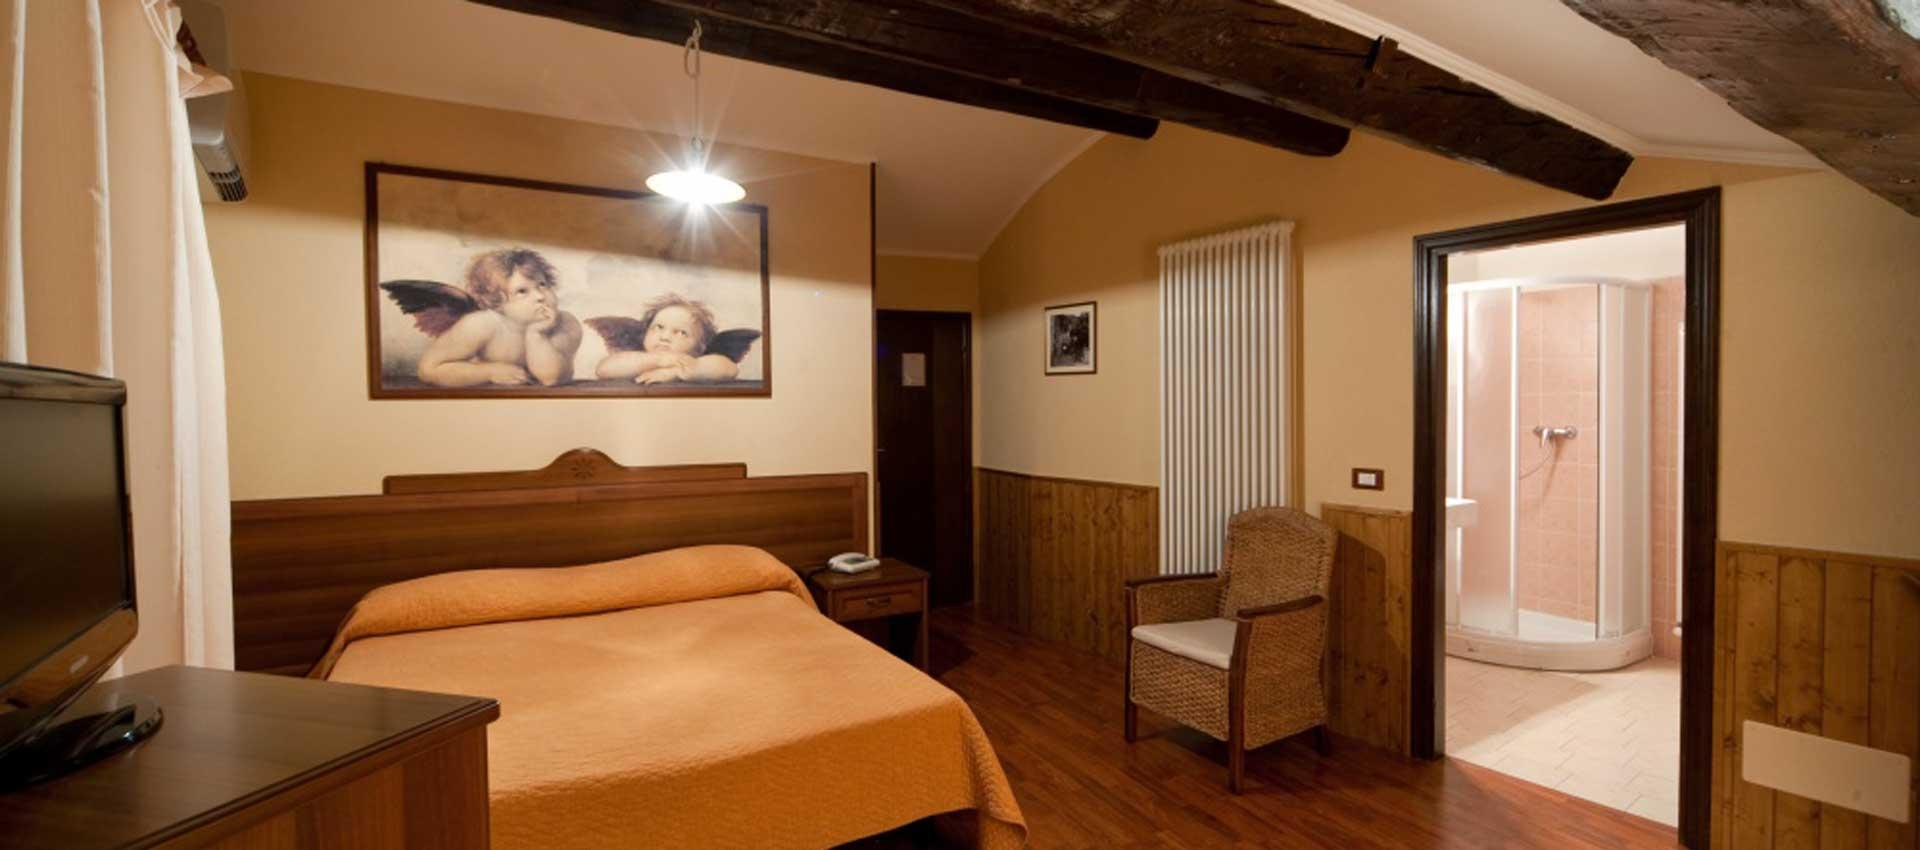 camera-hotel-da-lino-san-marino_1920x850